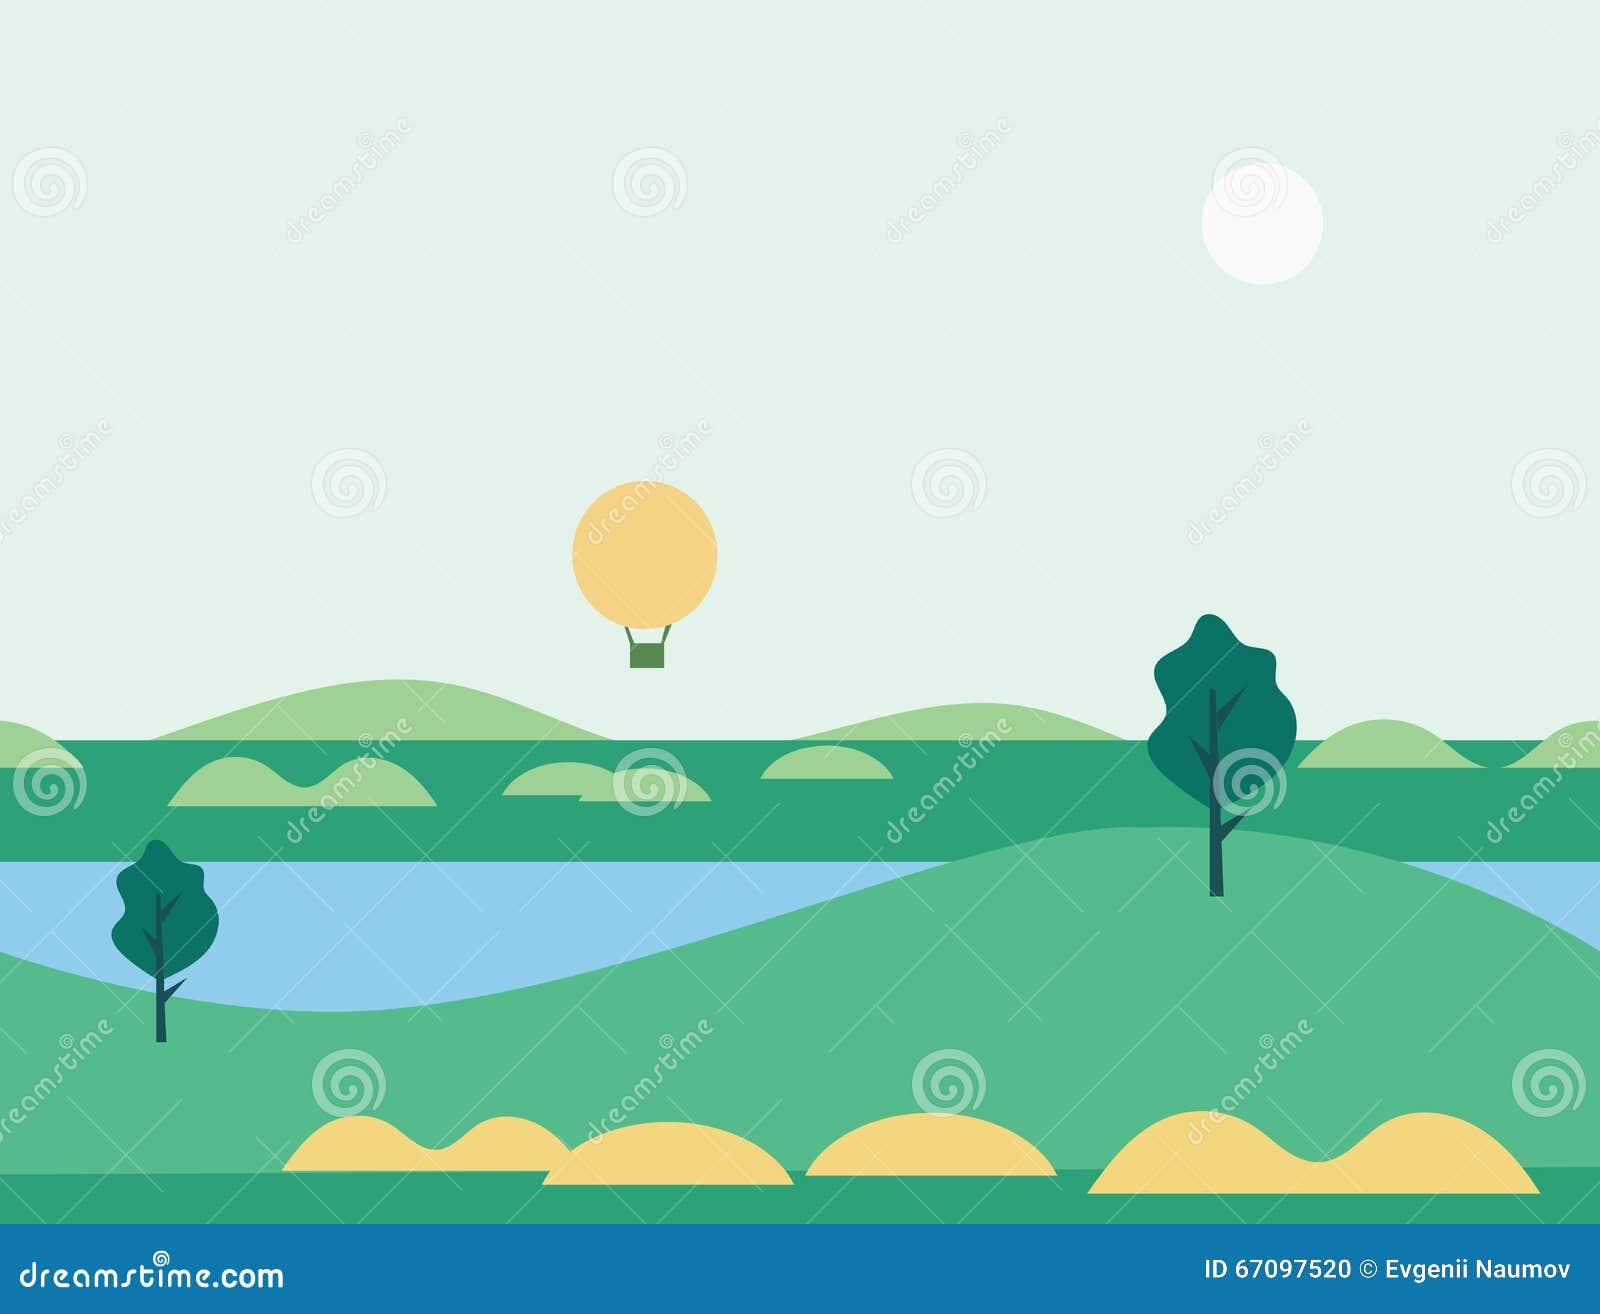 Landscape Illustration Vector Free: Seamless Cartoon Nature Landscape With Balloon, Vector